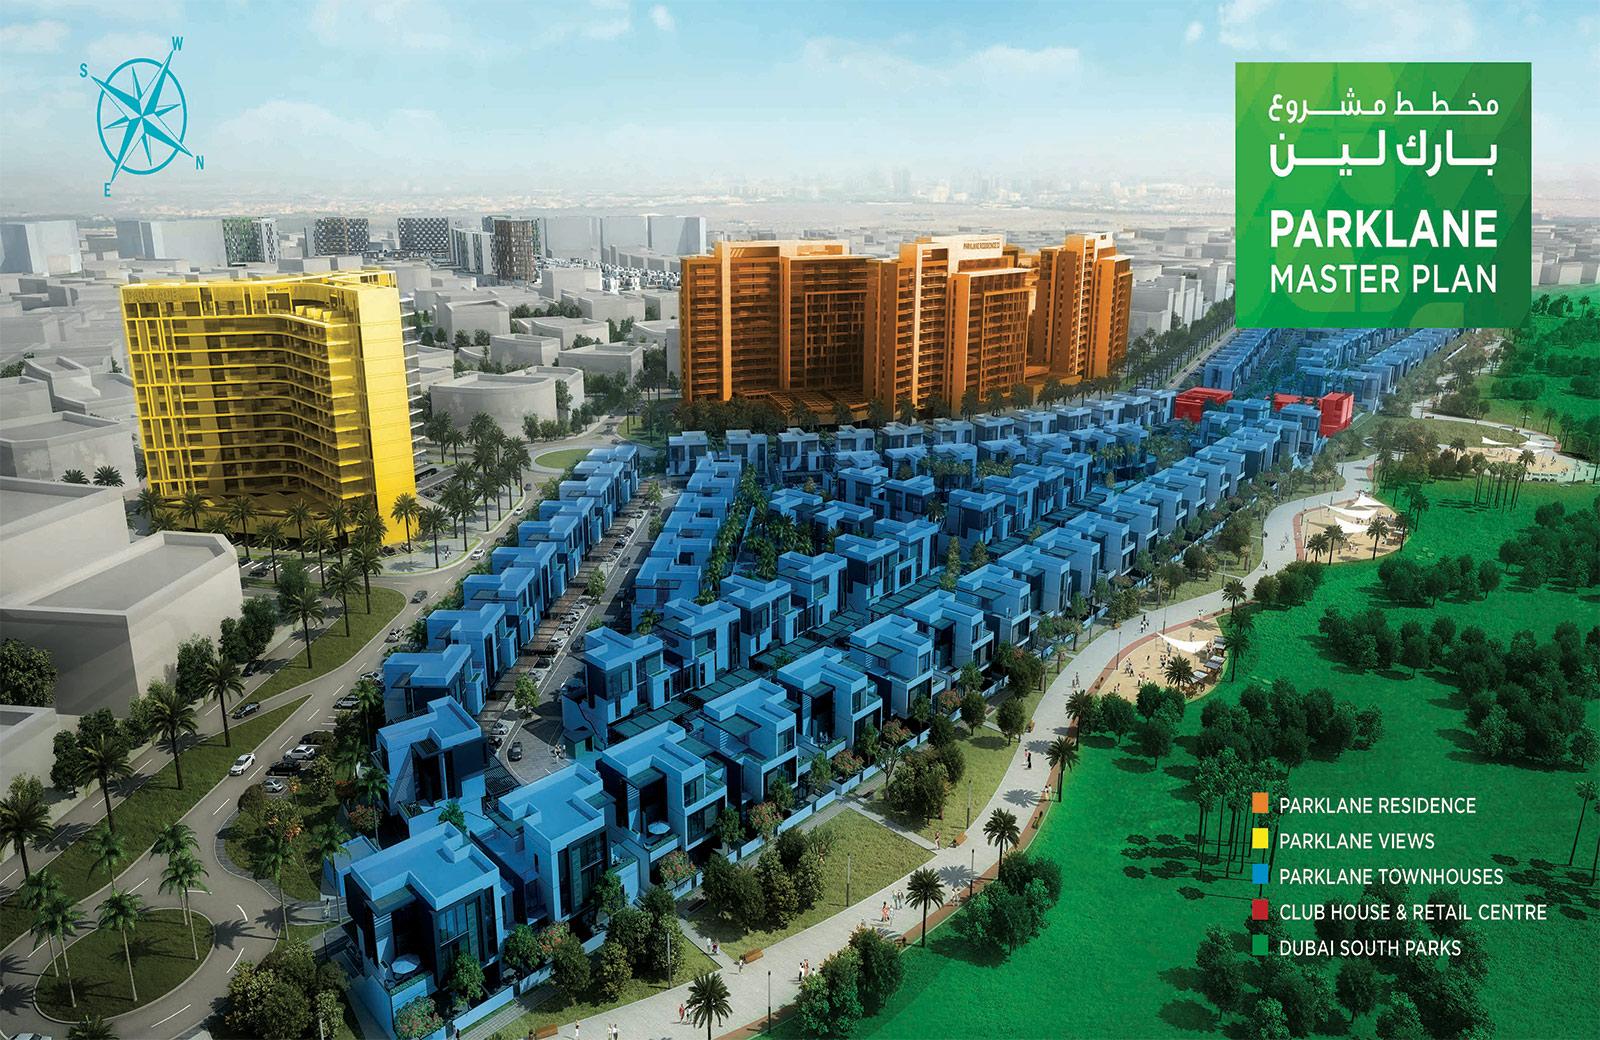 Parklane-Dubai-South Master Plan